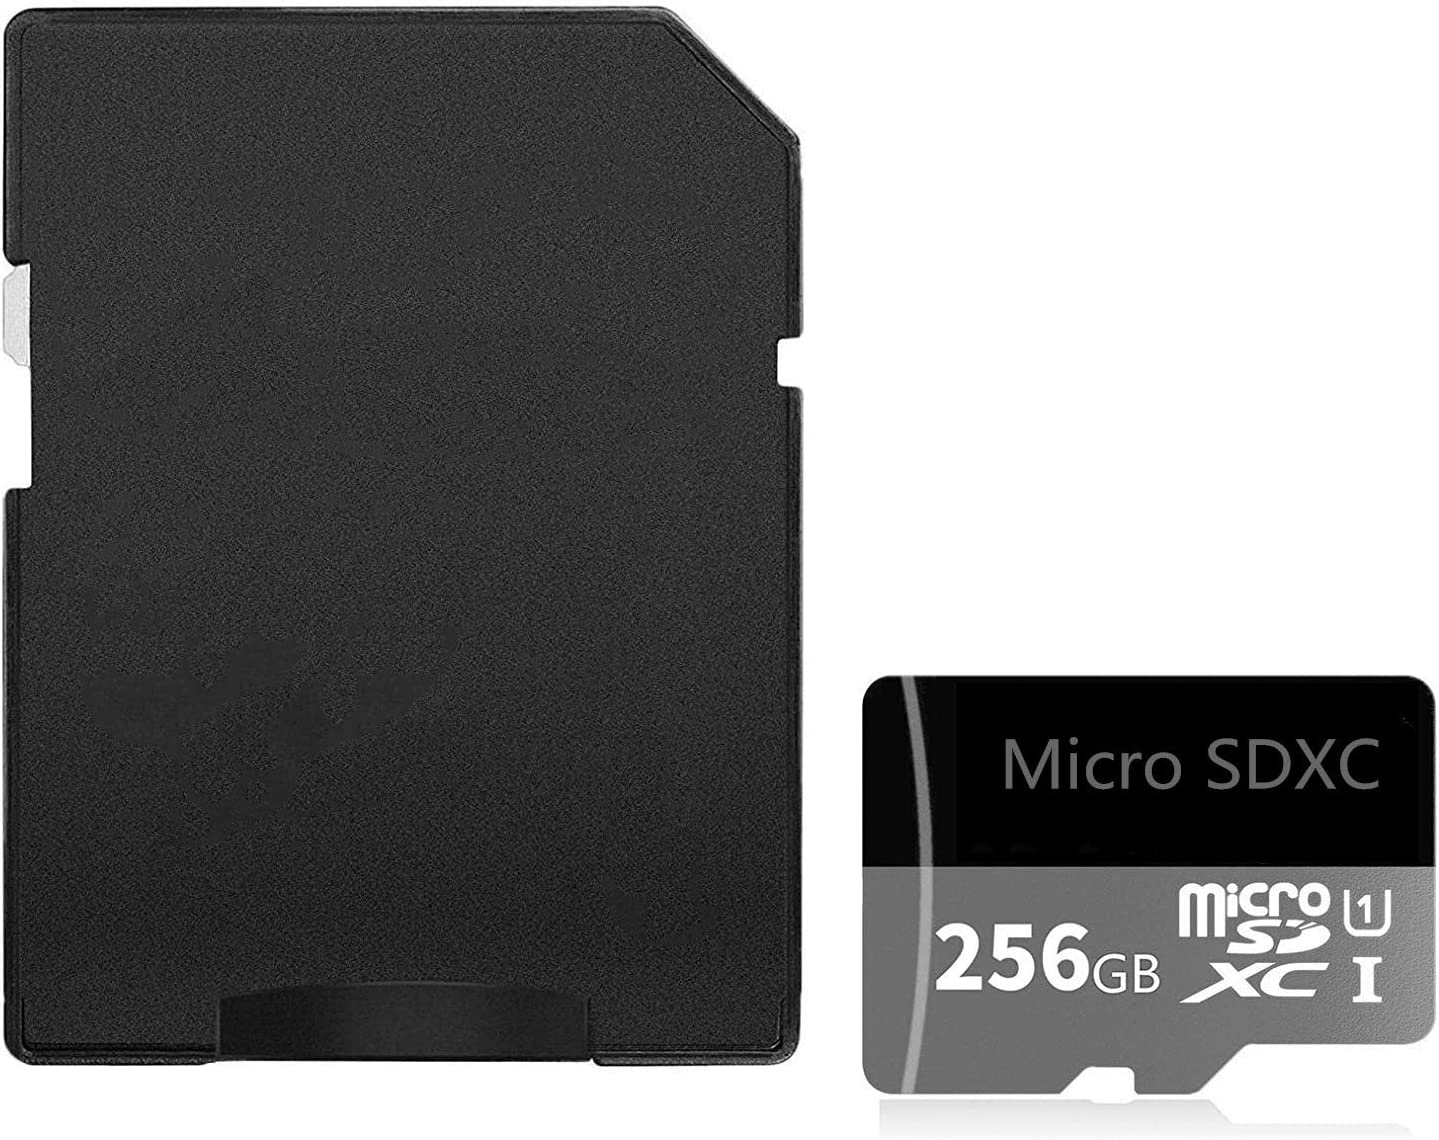 Tarjeta Micro SD SDXC de alta velocidad de 256 GB clase 10 con adaptador